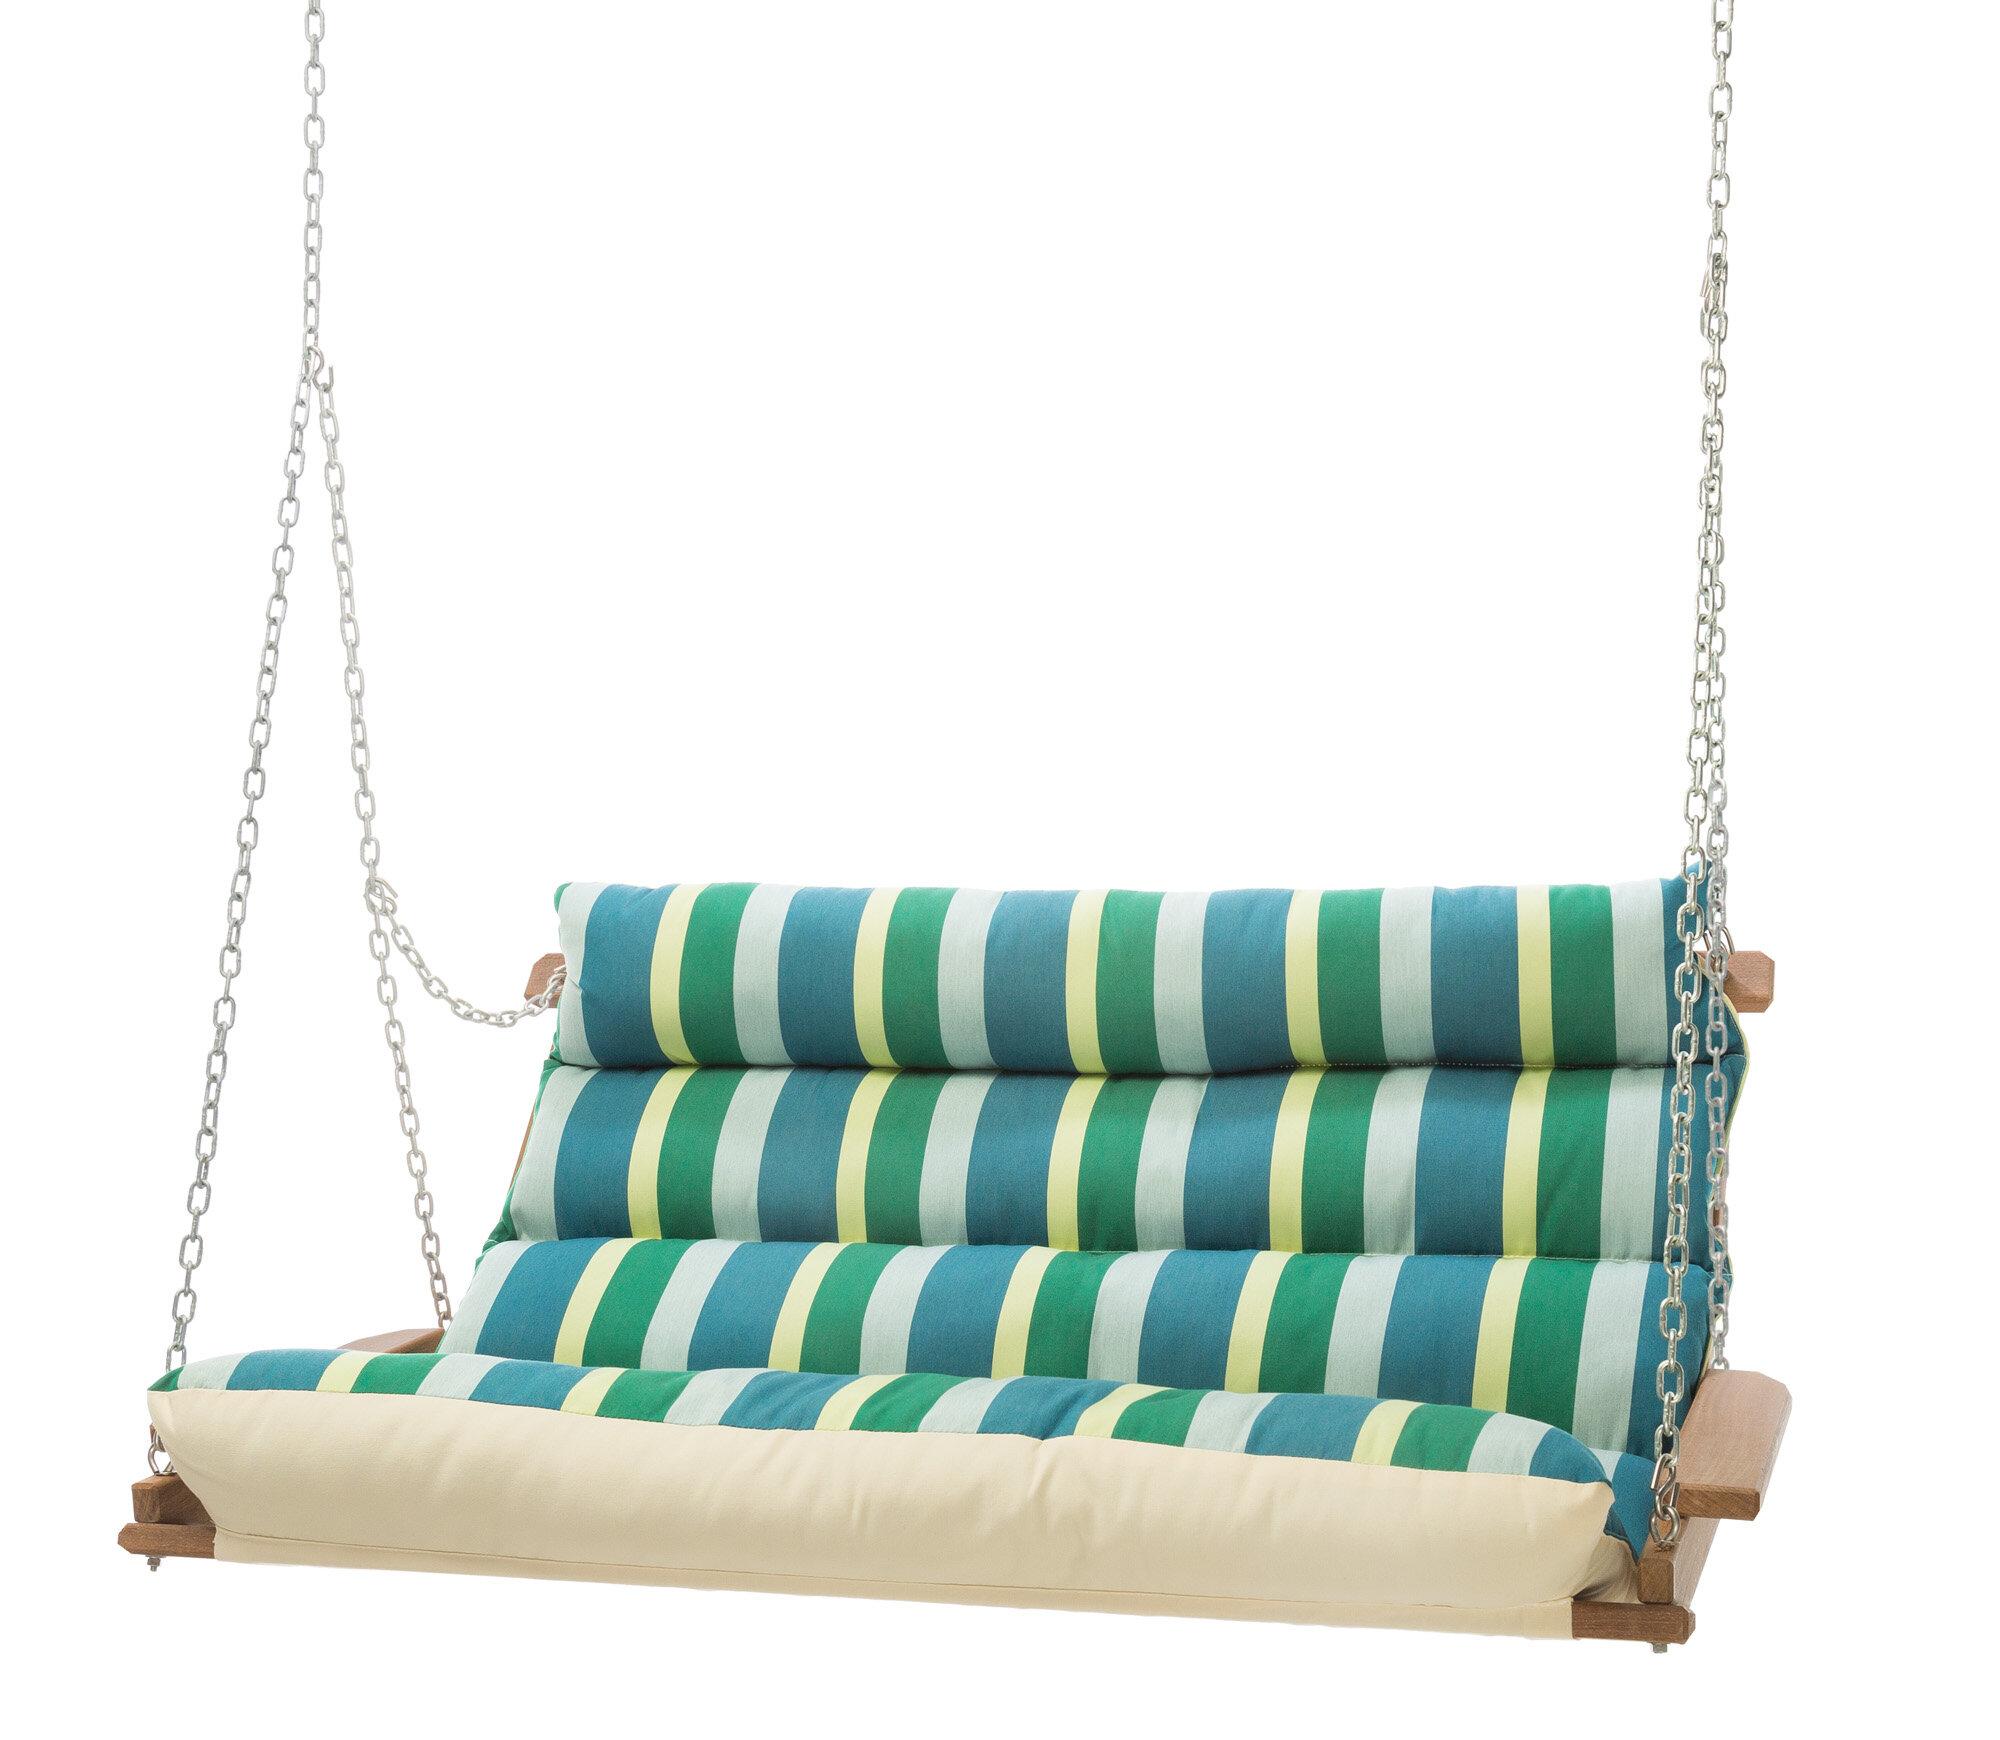 Pacheco Deluxe Sunbrella Porch Swing In Deluxe Cushion Sunbrella Porch Swings (View 3 of 25)